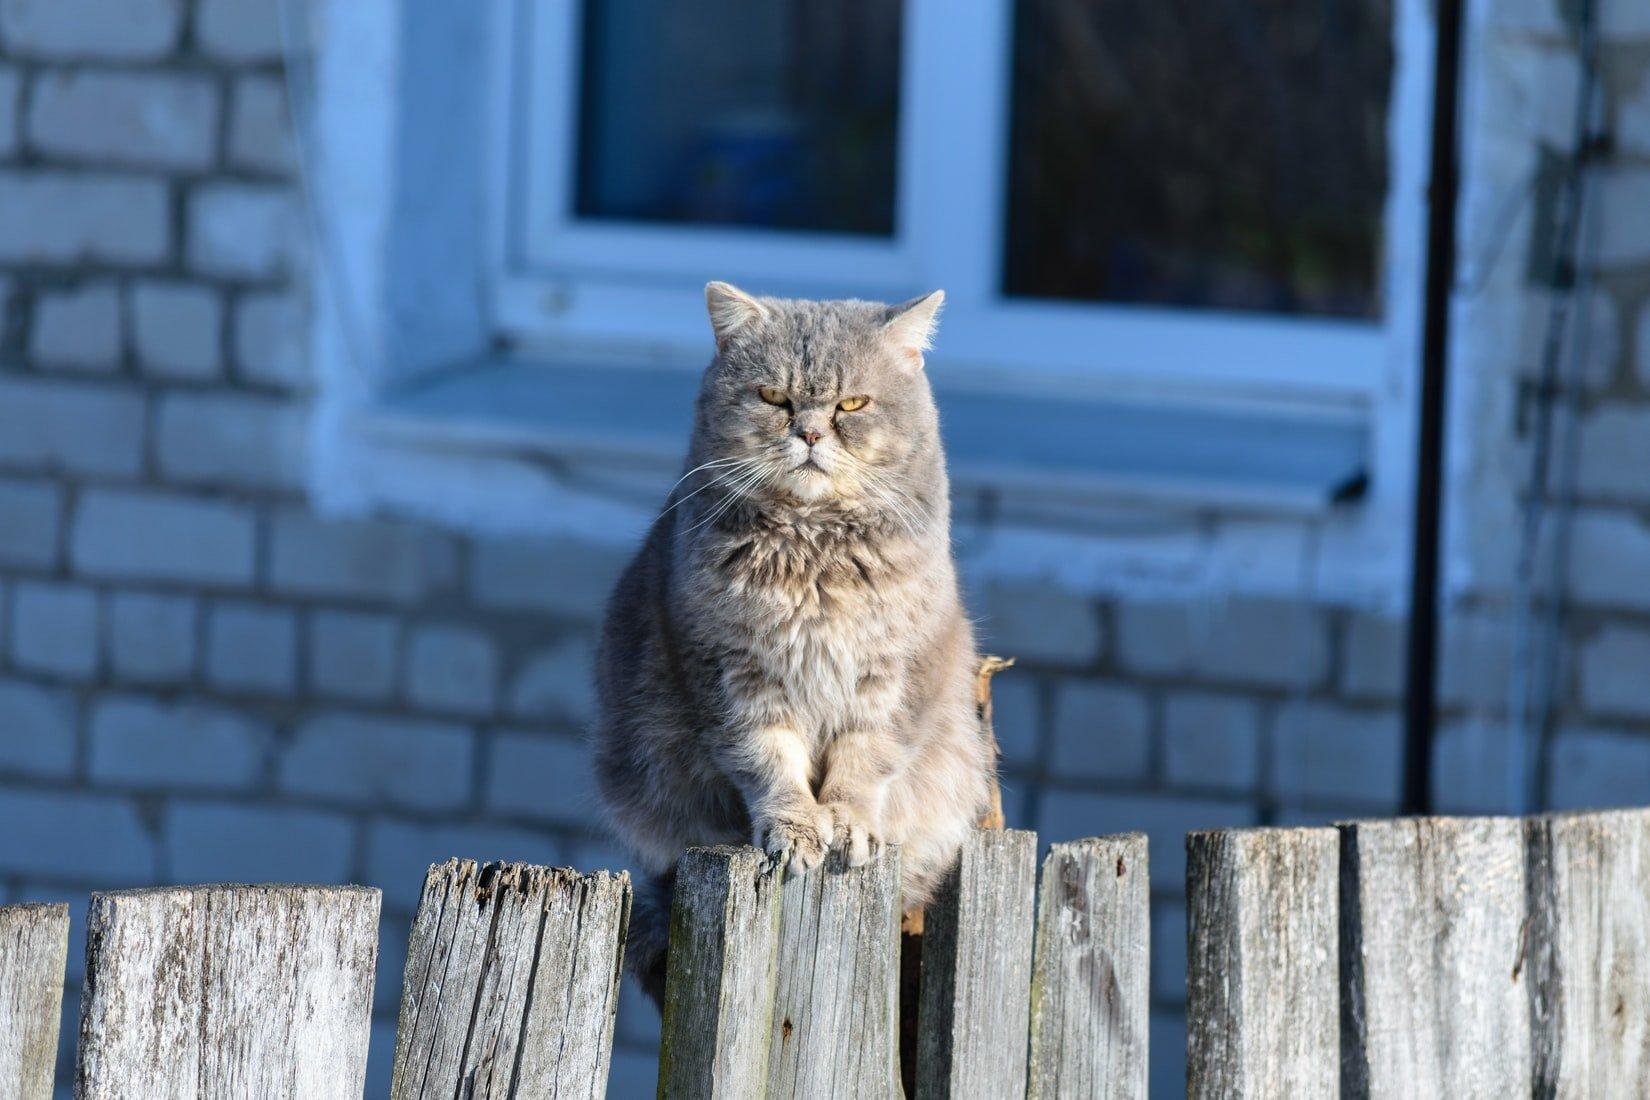 can cats sense bad energy